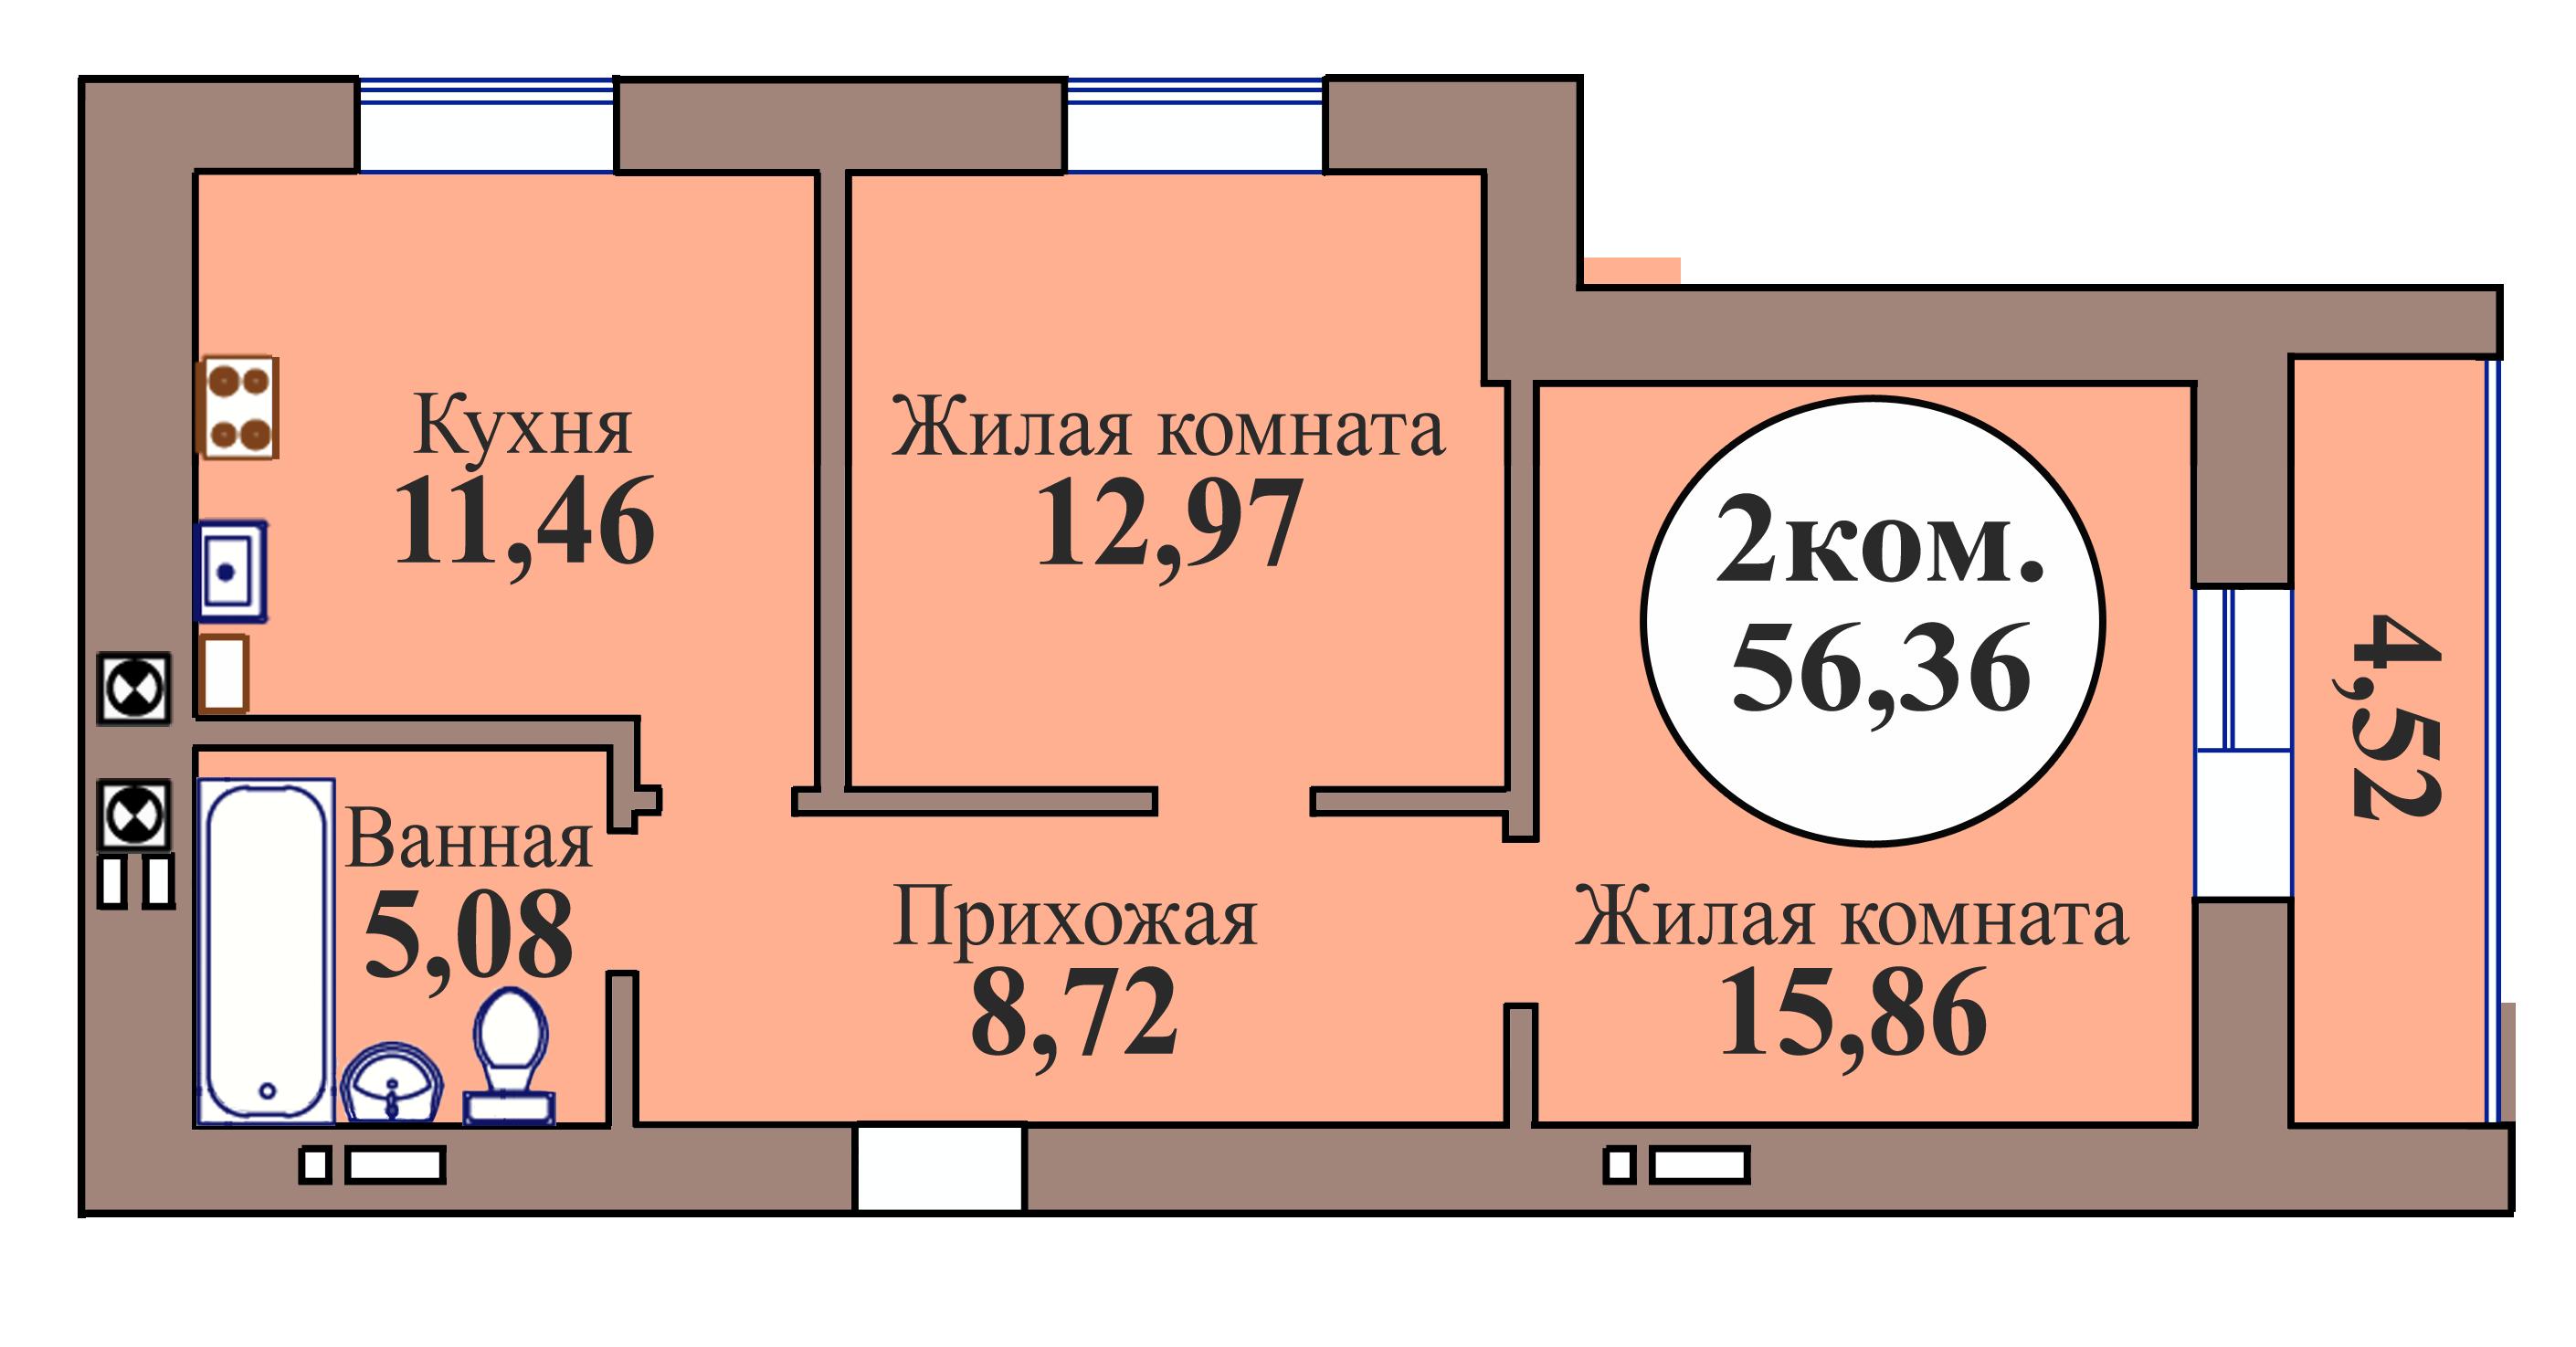 2-комн. кв. по пер. Калининградский, 5 кв. 122 в Калининграде